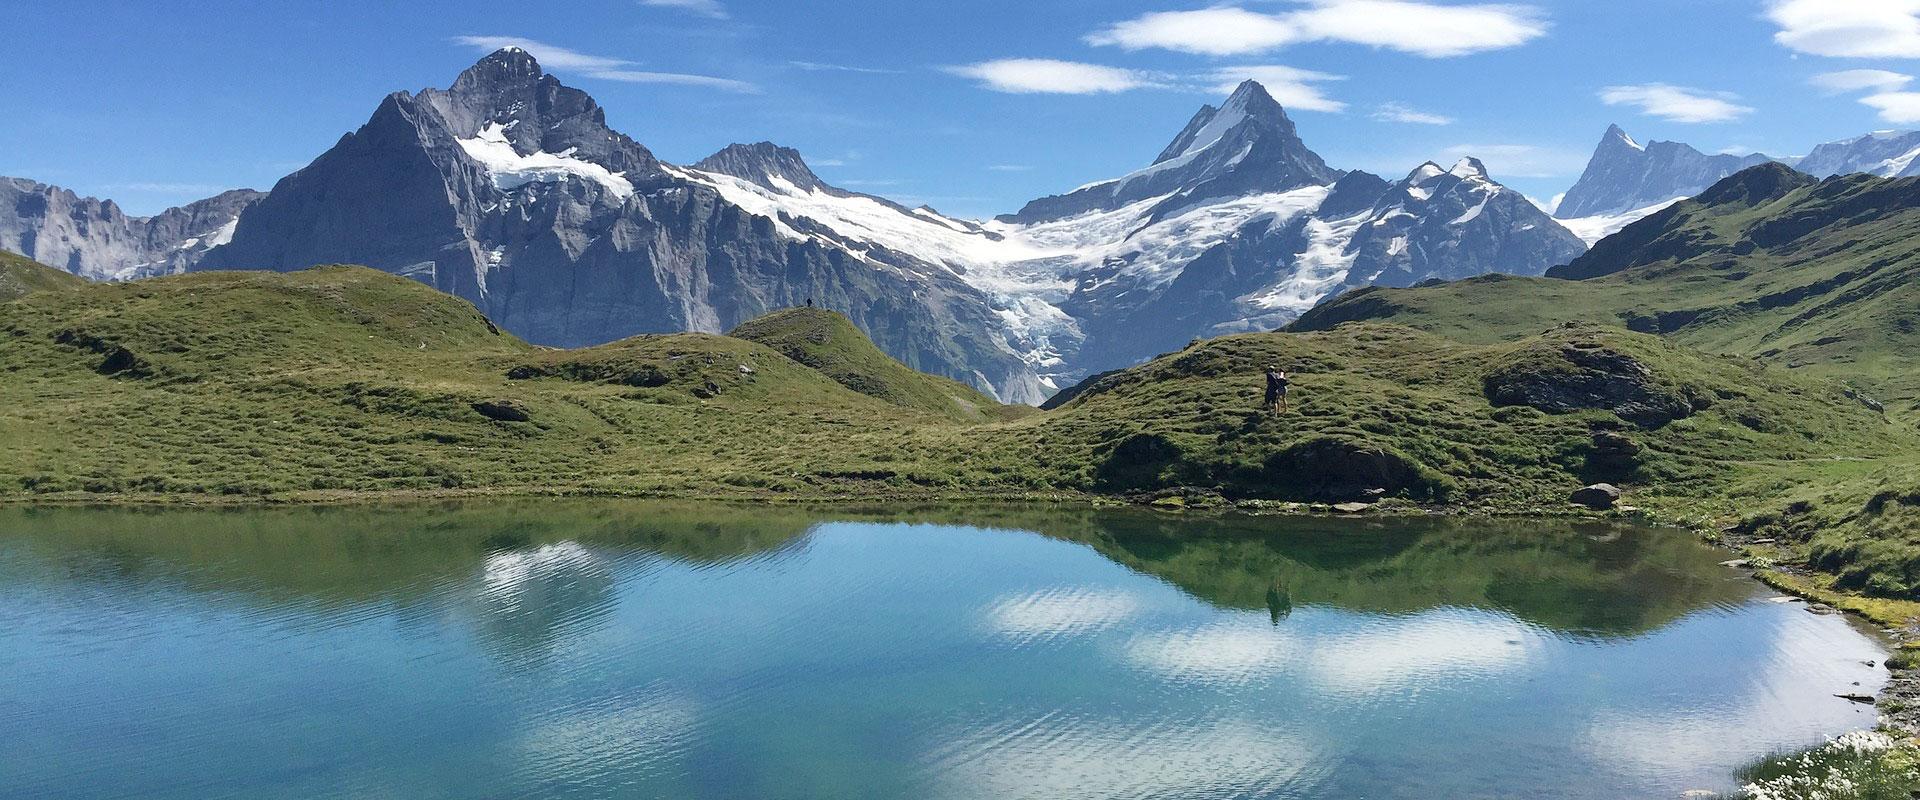 Bachalpsee bei Grindelwald im Berner Oberland